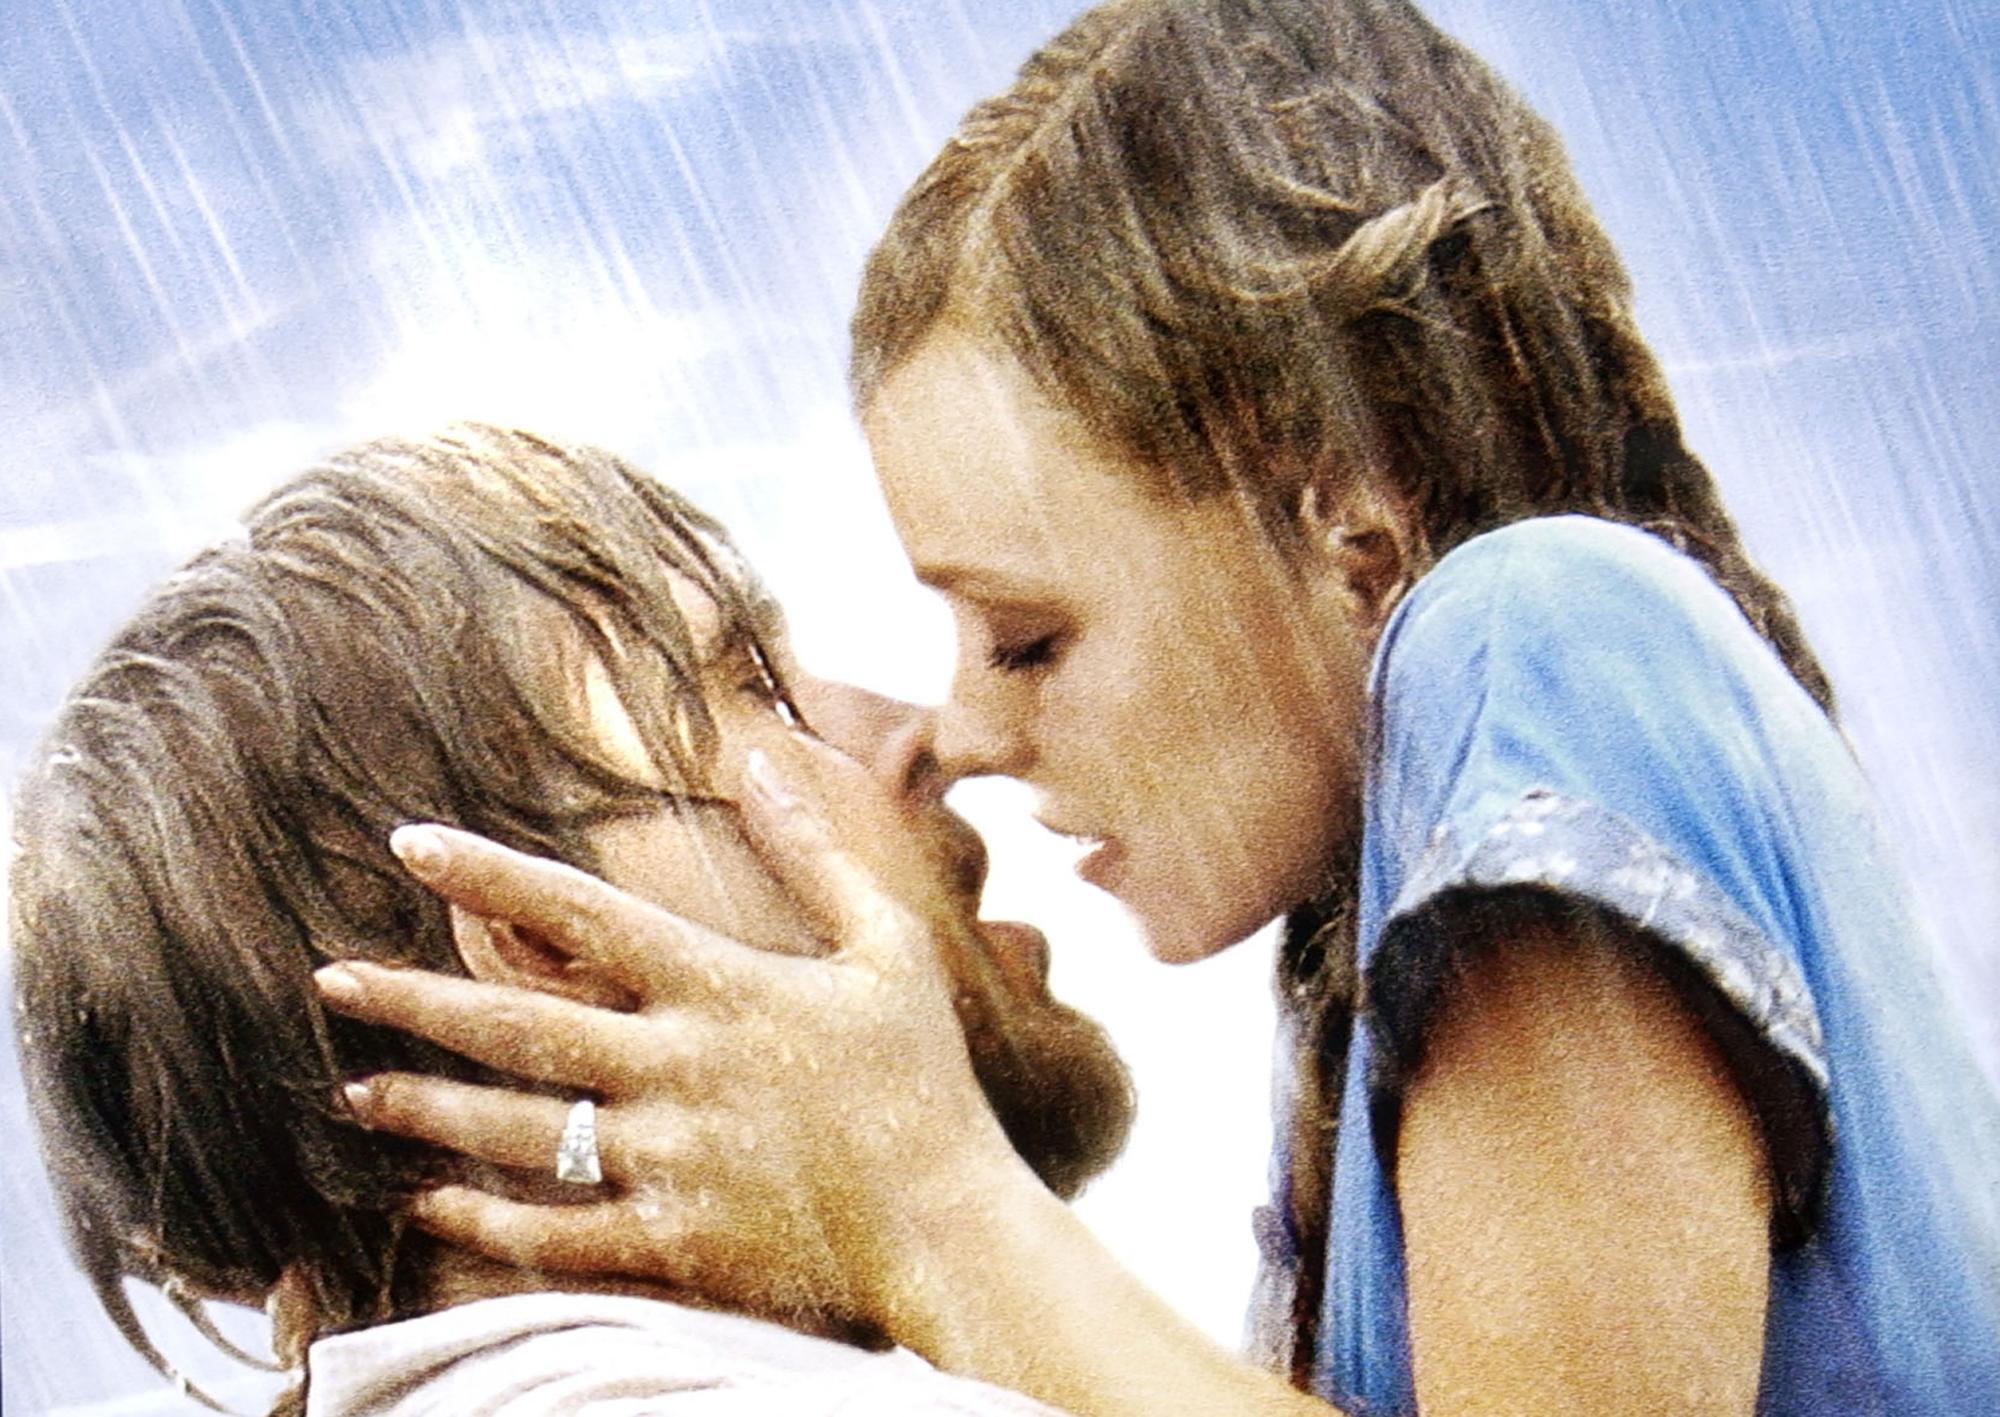 movies romance netflix romantic cinema wallach eli gifted bad wireimage line right